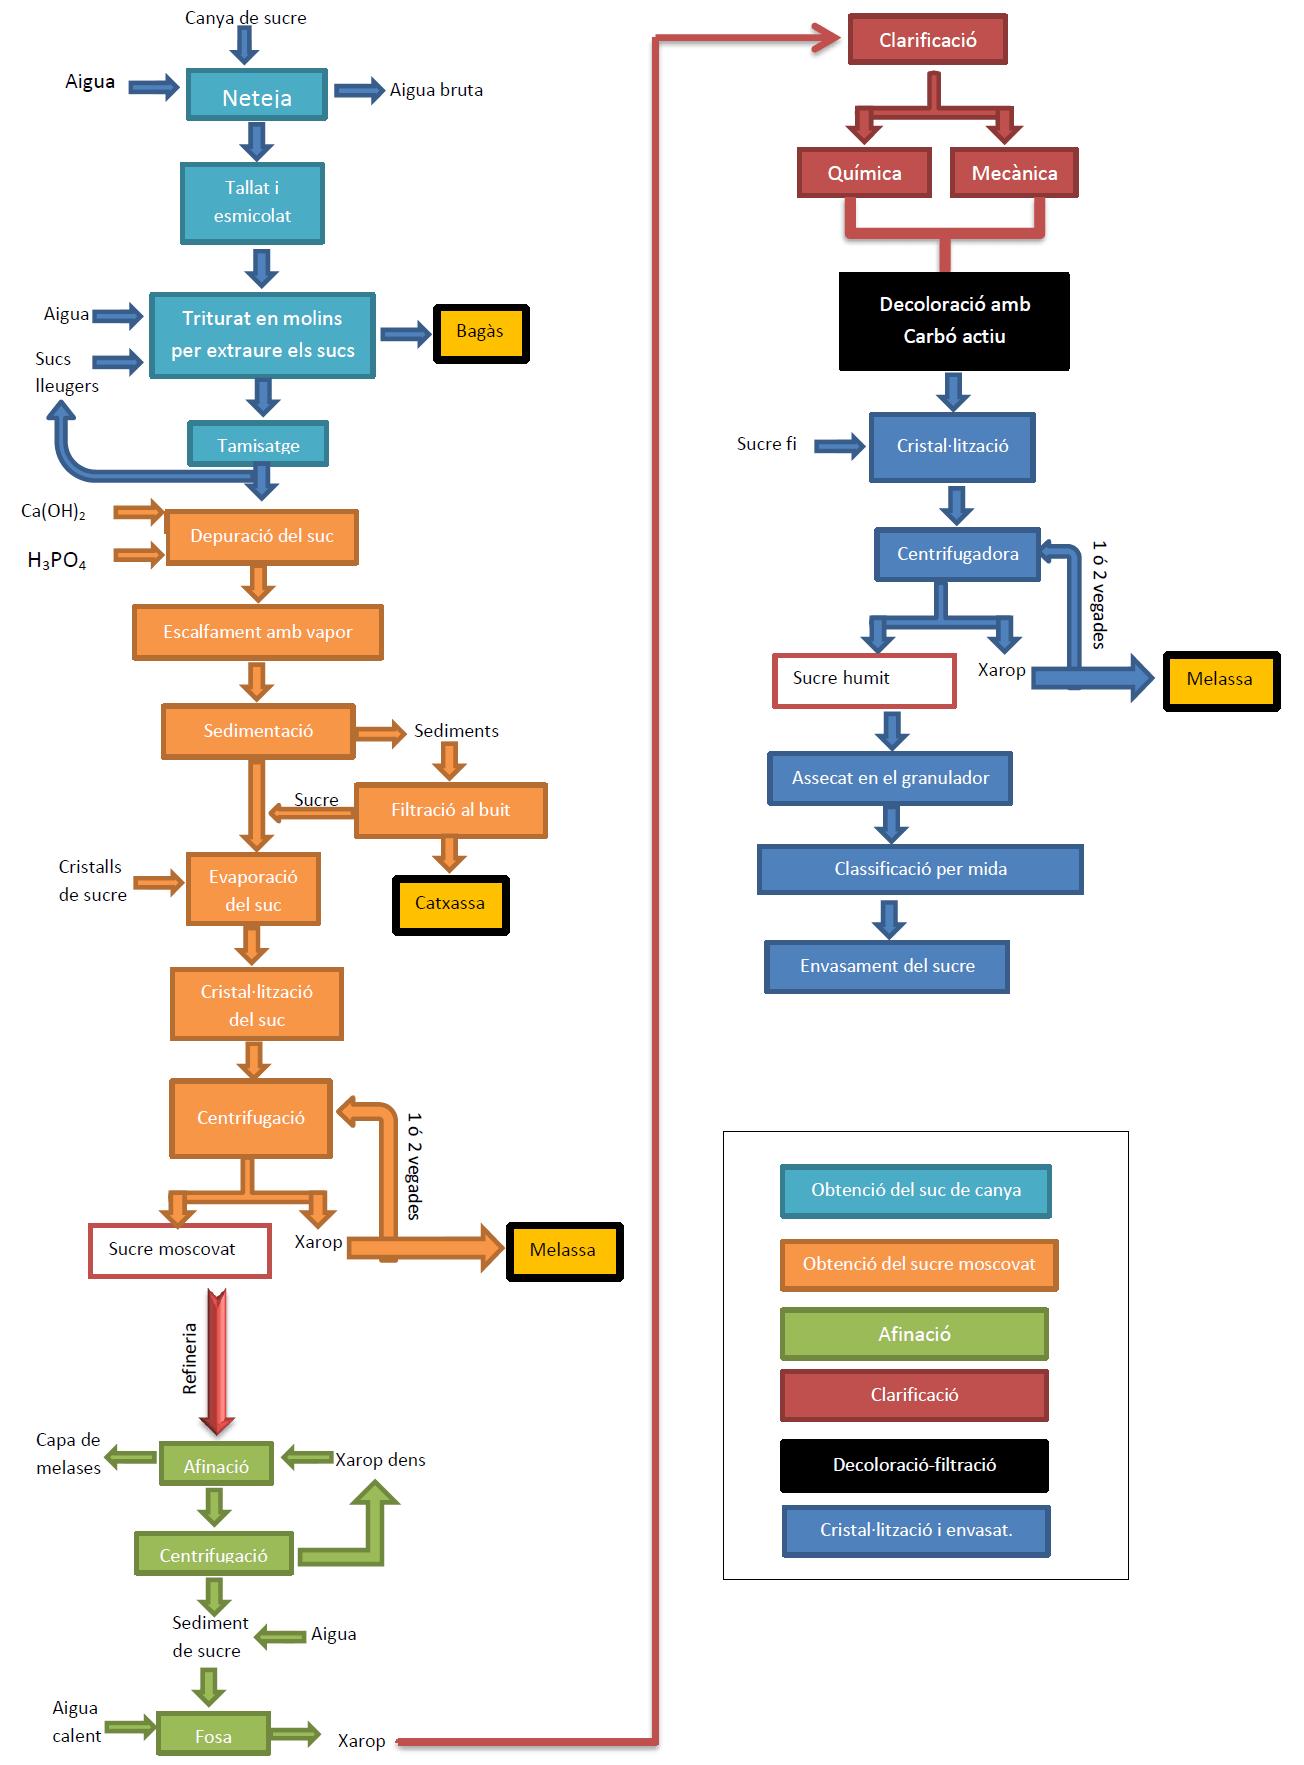 hight resolution of file diagrama de flux sucre de canya png